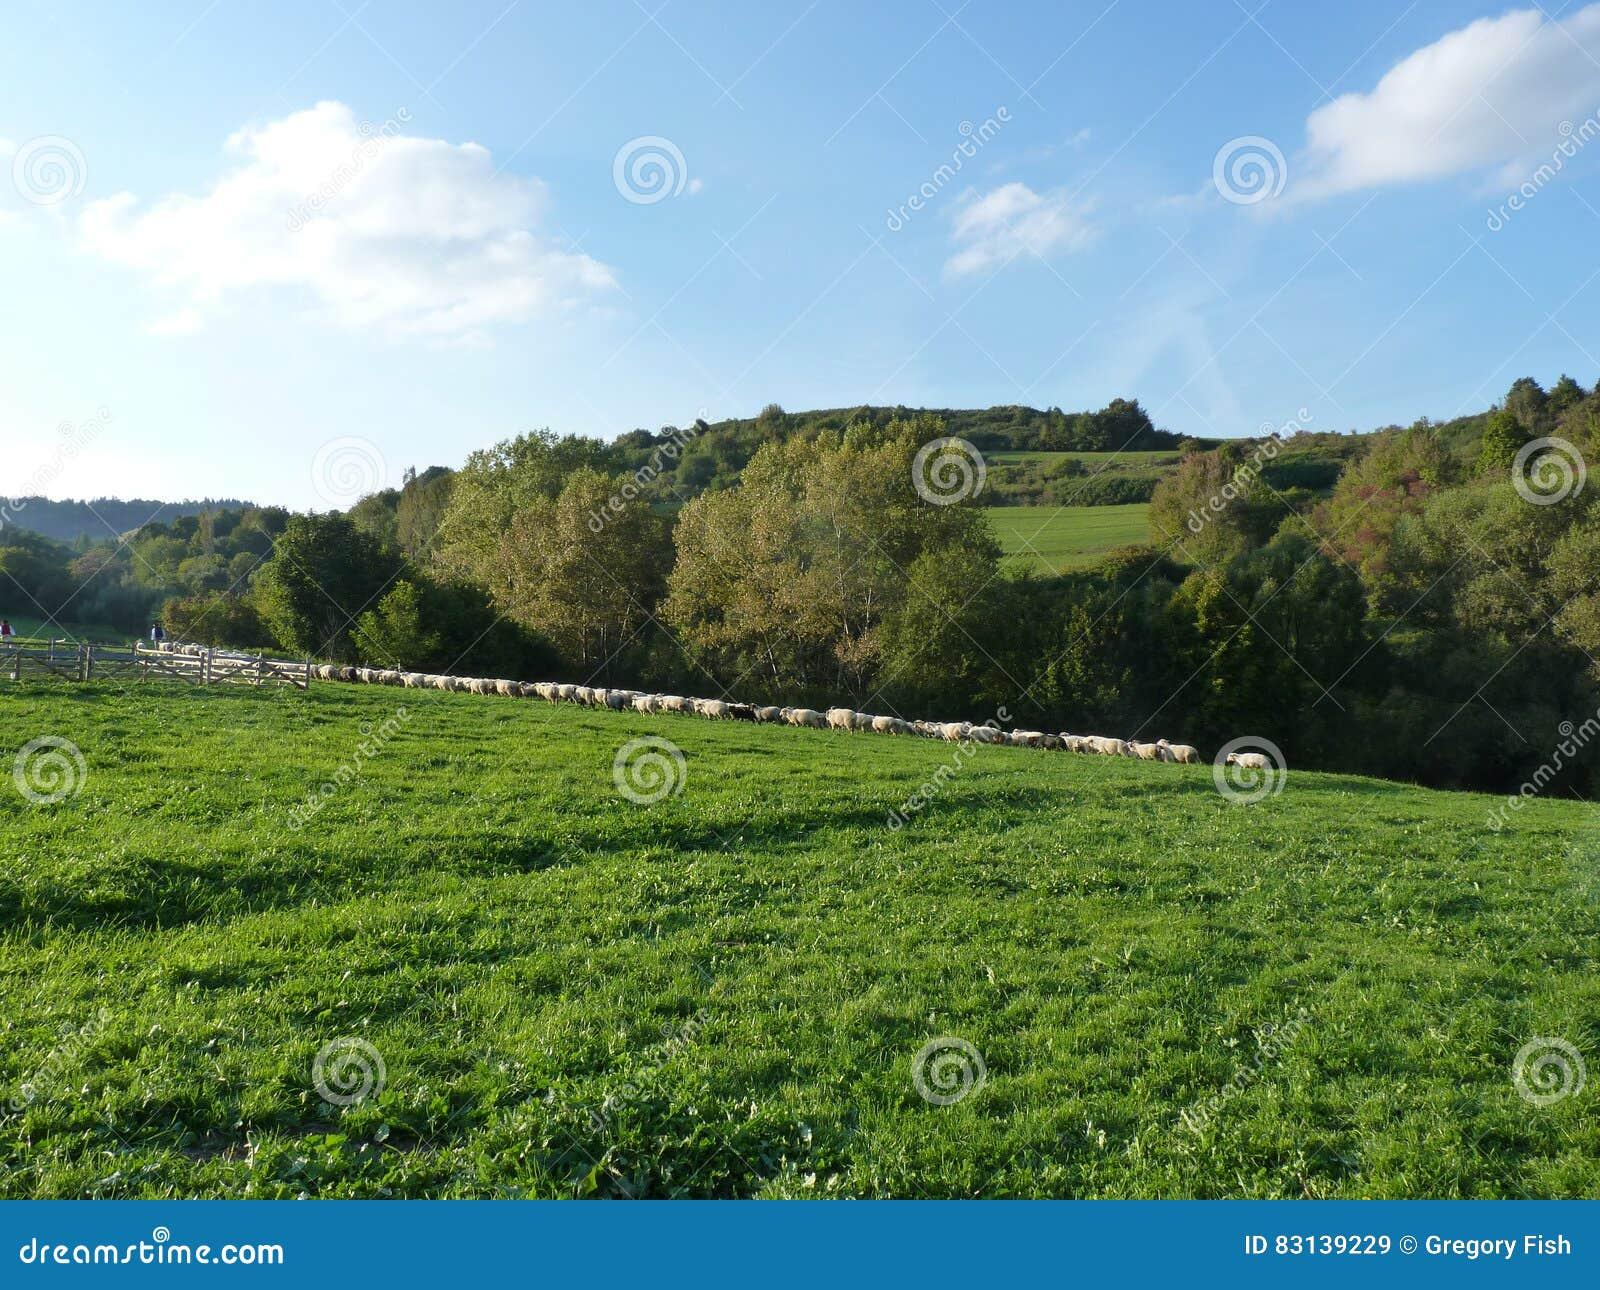 Beautiful grazing flock of sheep at sunset